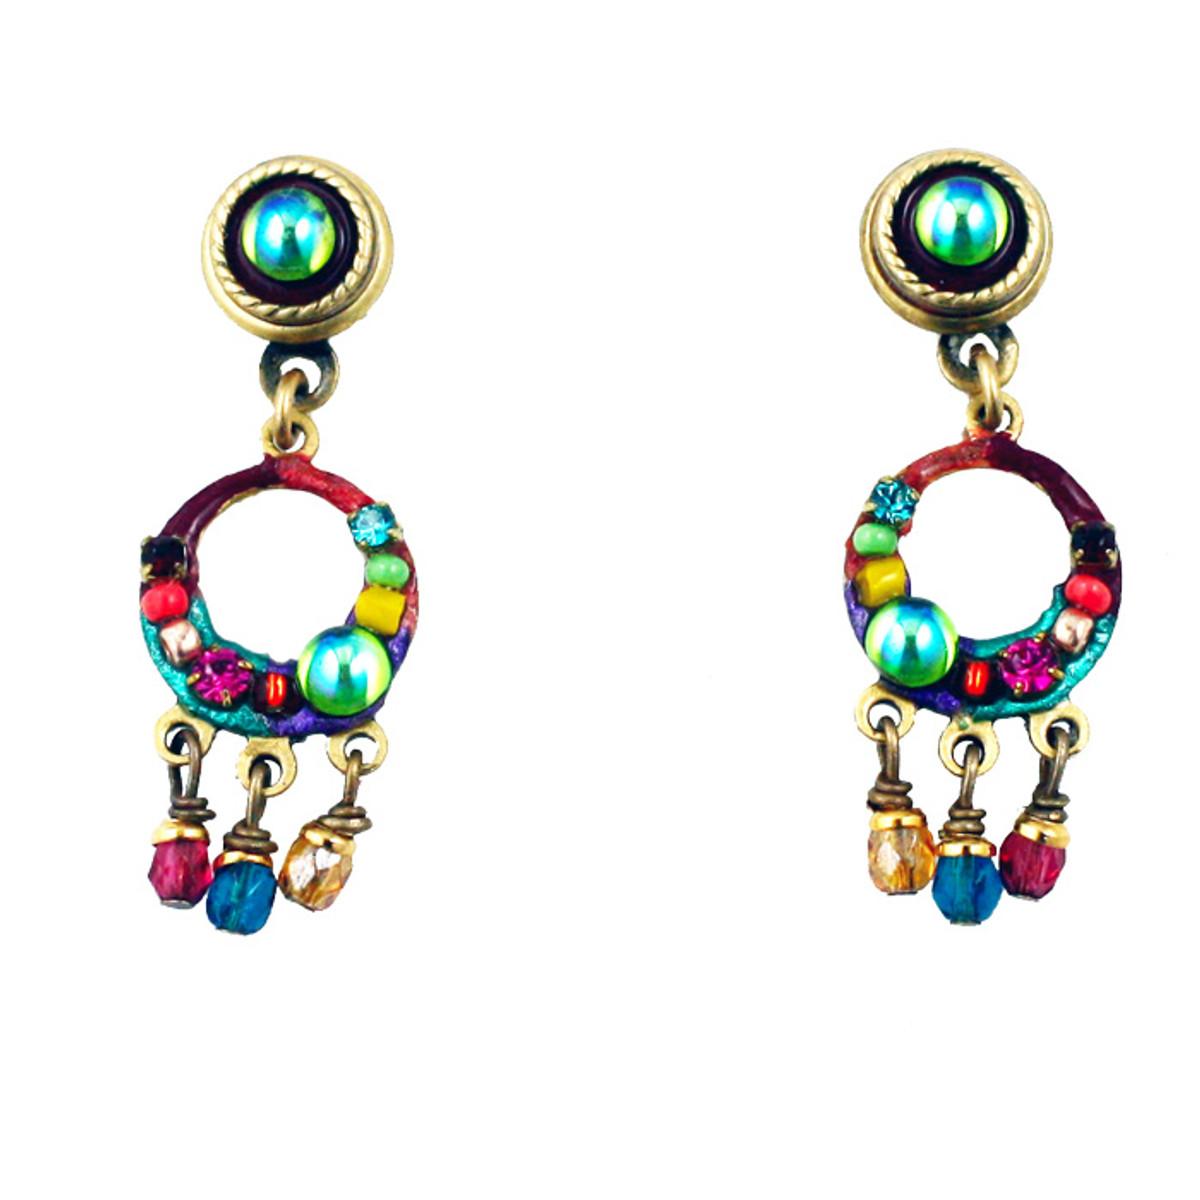 Michal Golan Earrings - Multibright petit hoop